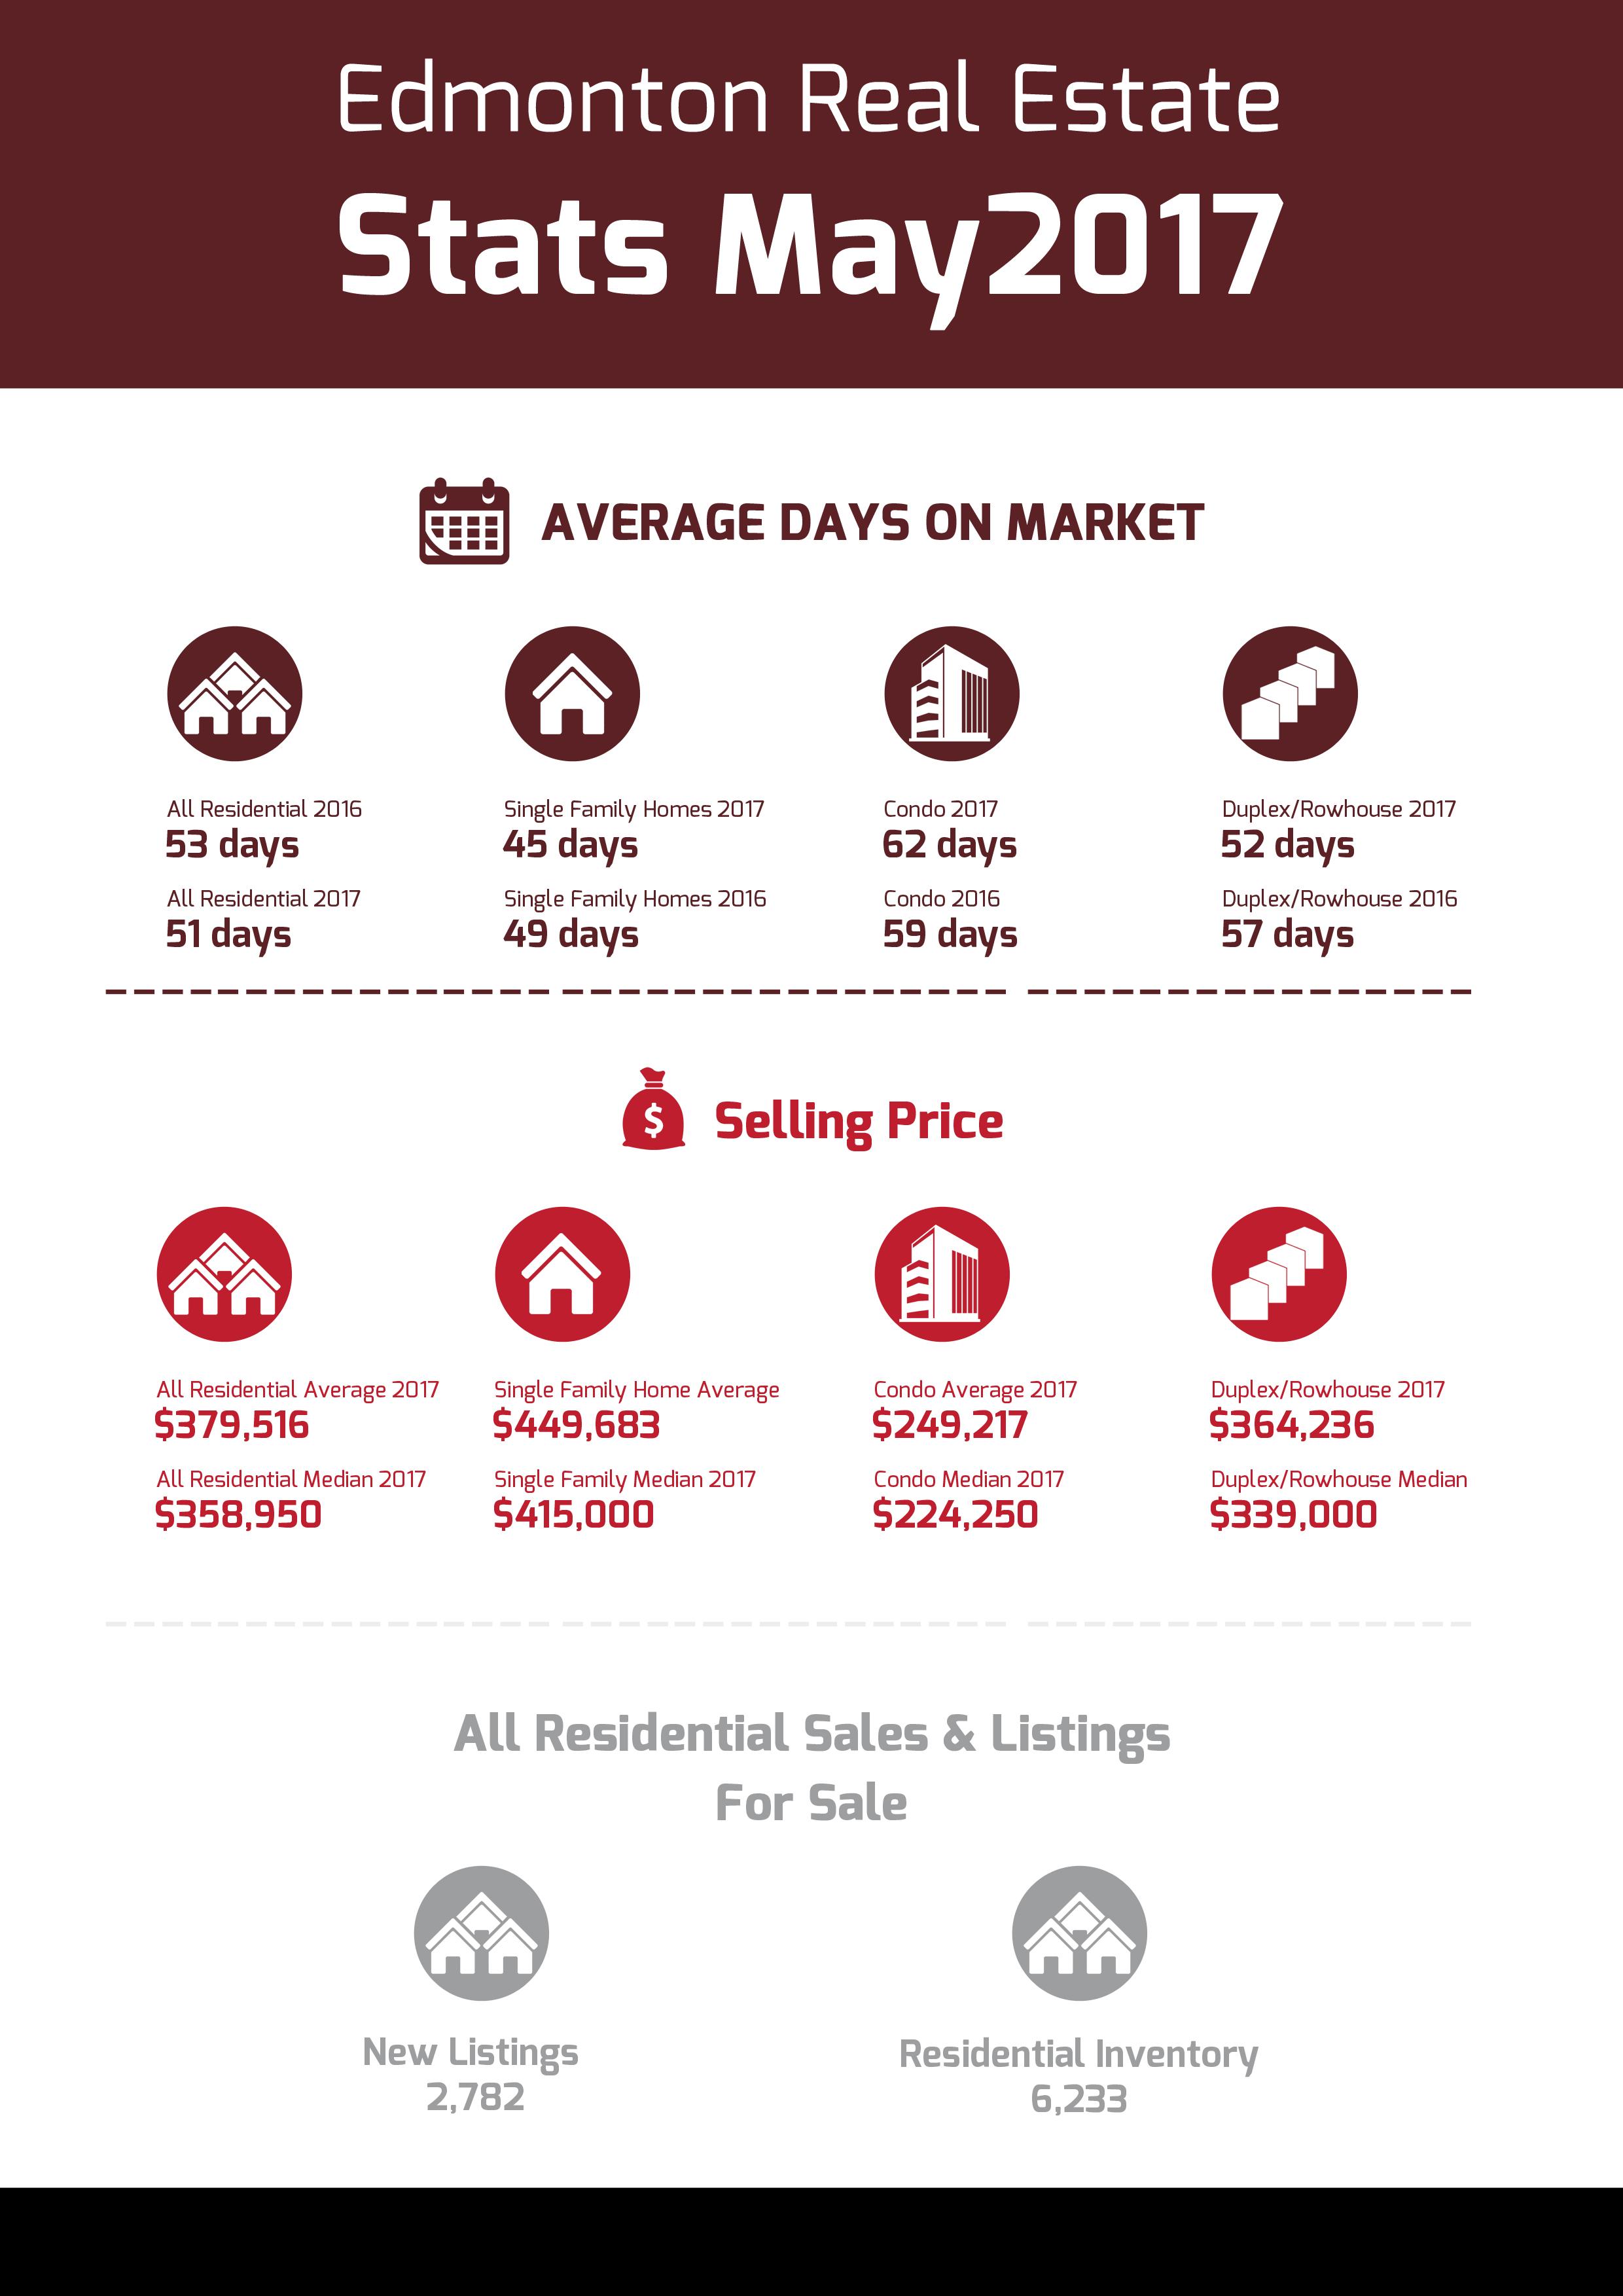 Edmonton Real Estates Stats May 2017